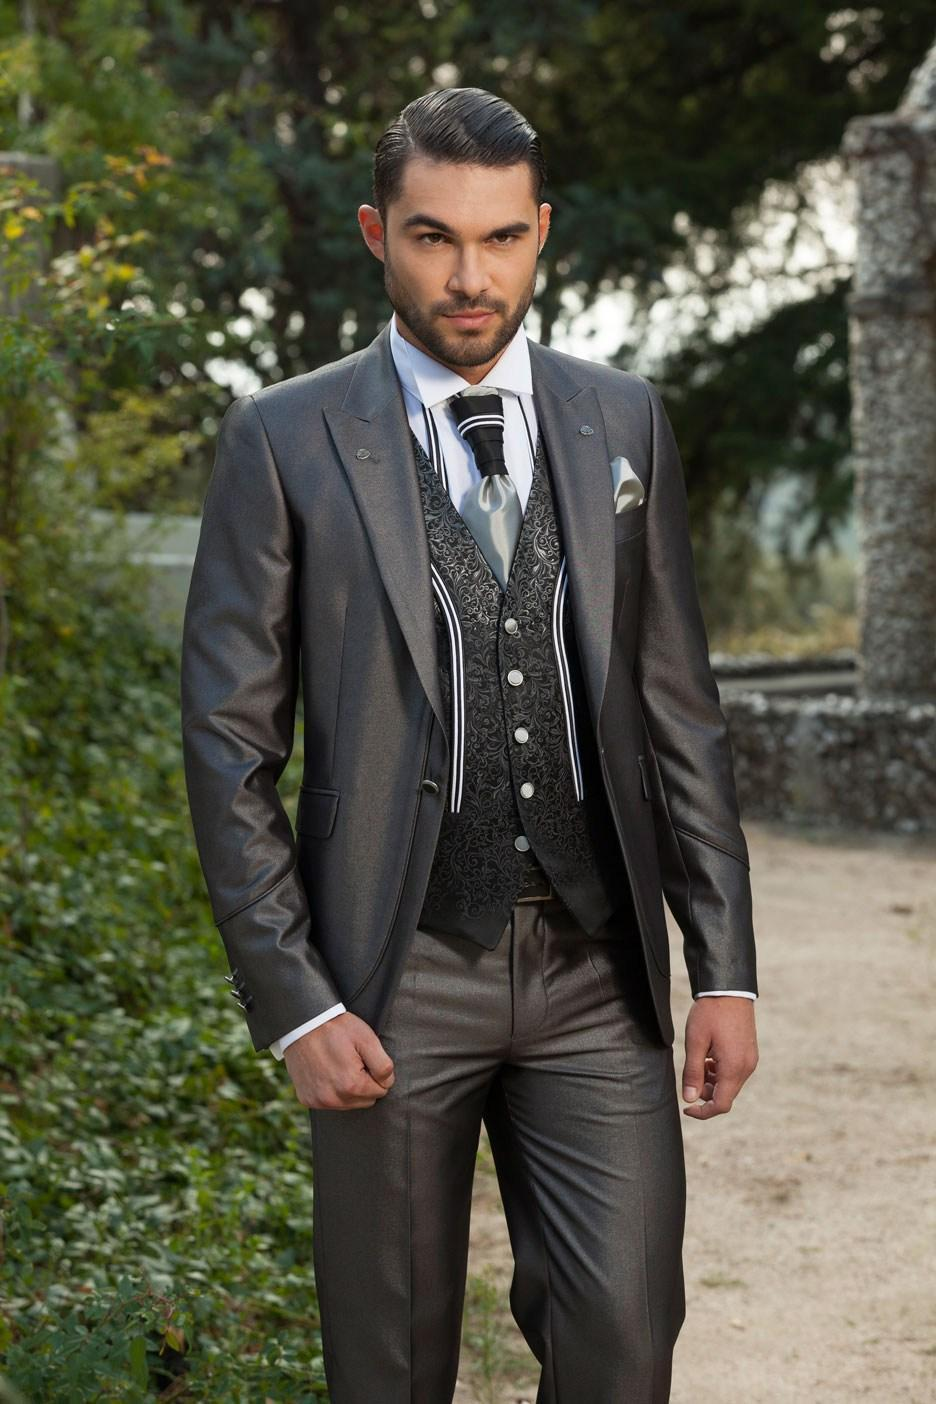 2019 New Style Groom Tuxedos Peak Lapel Men's Suit Shiny Grey Groomsman/Bridegroom Wedding/Prom Suits (Jacket+Pants)